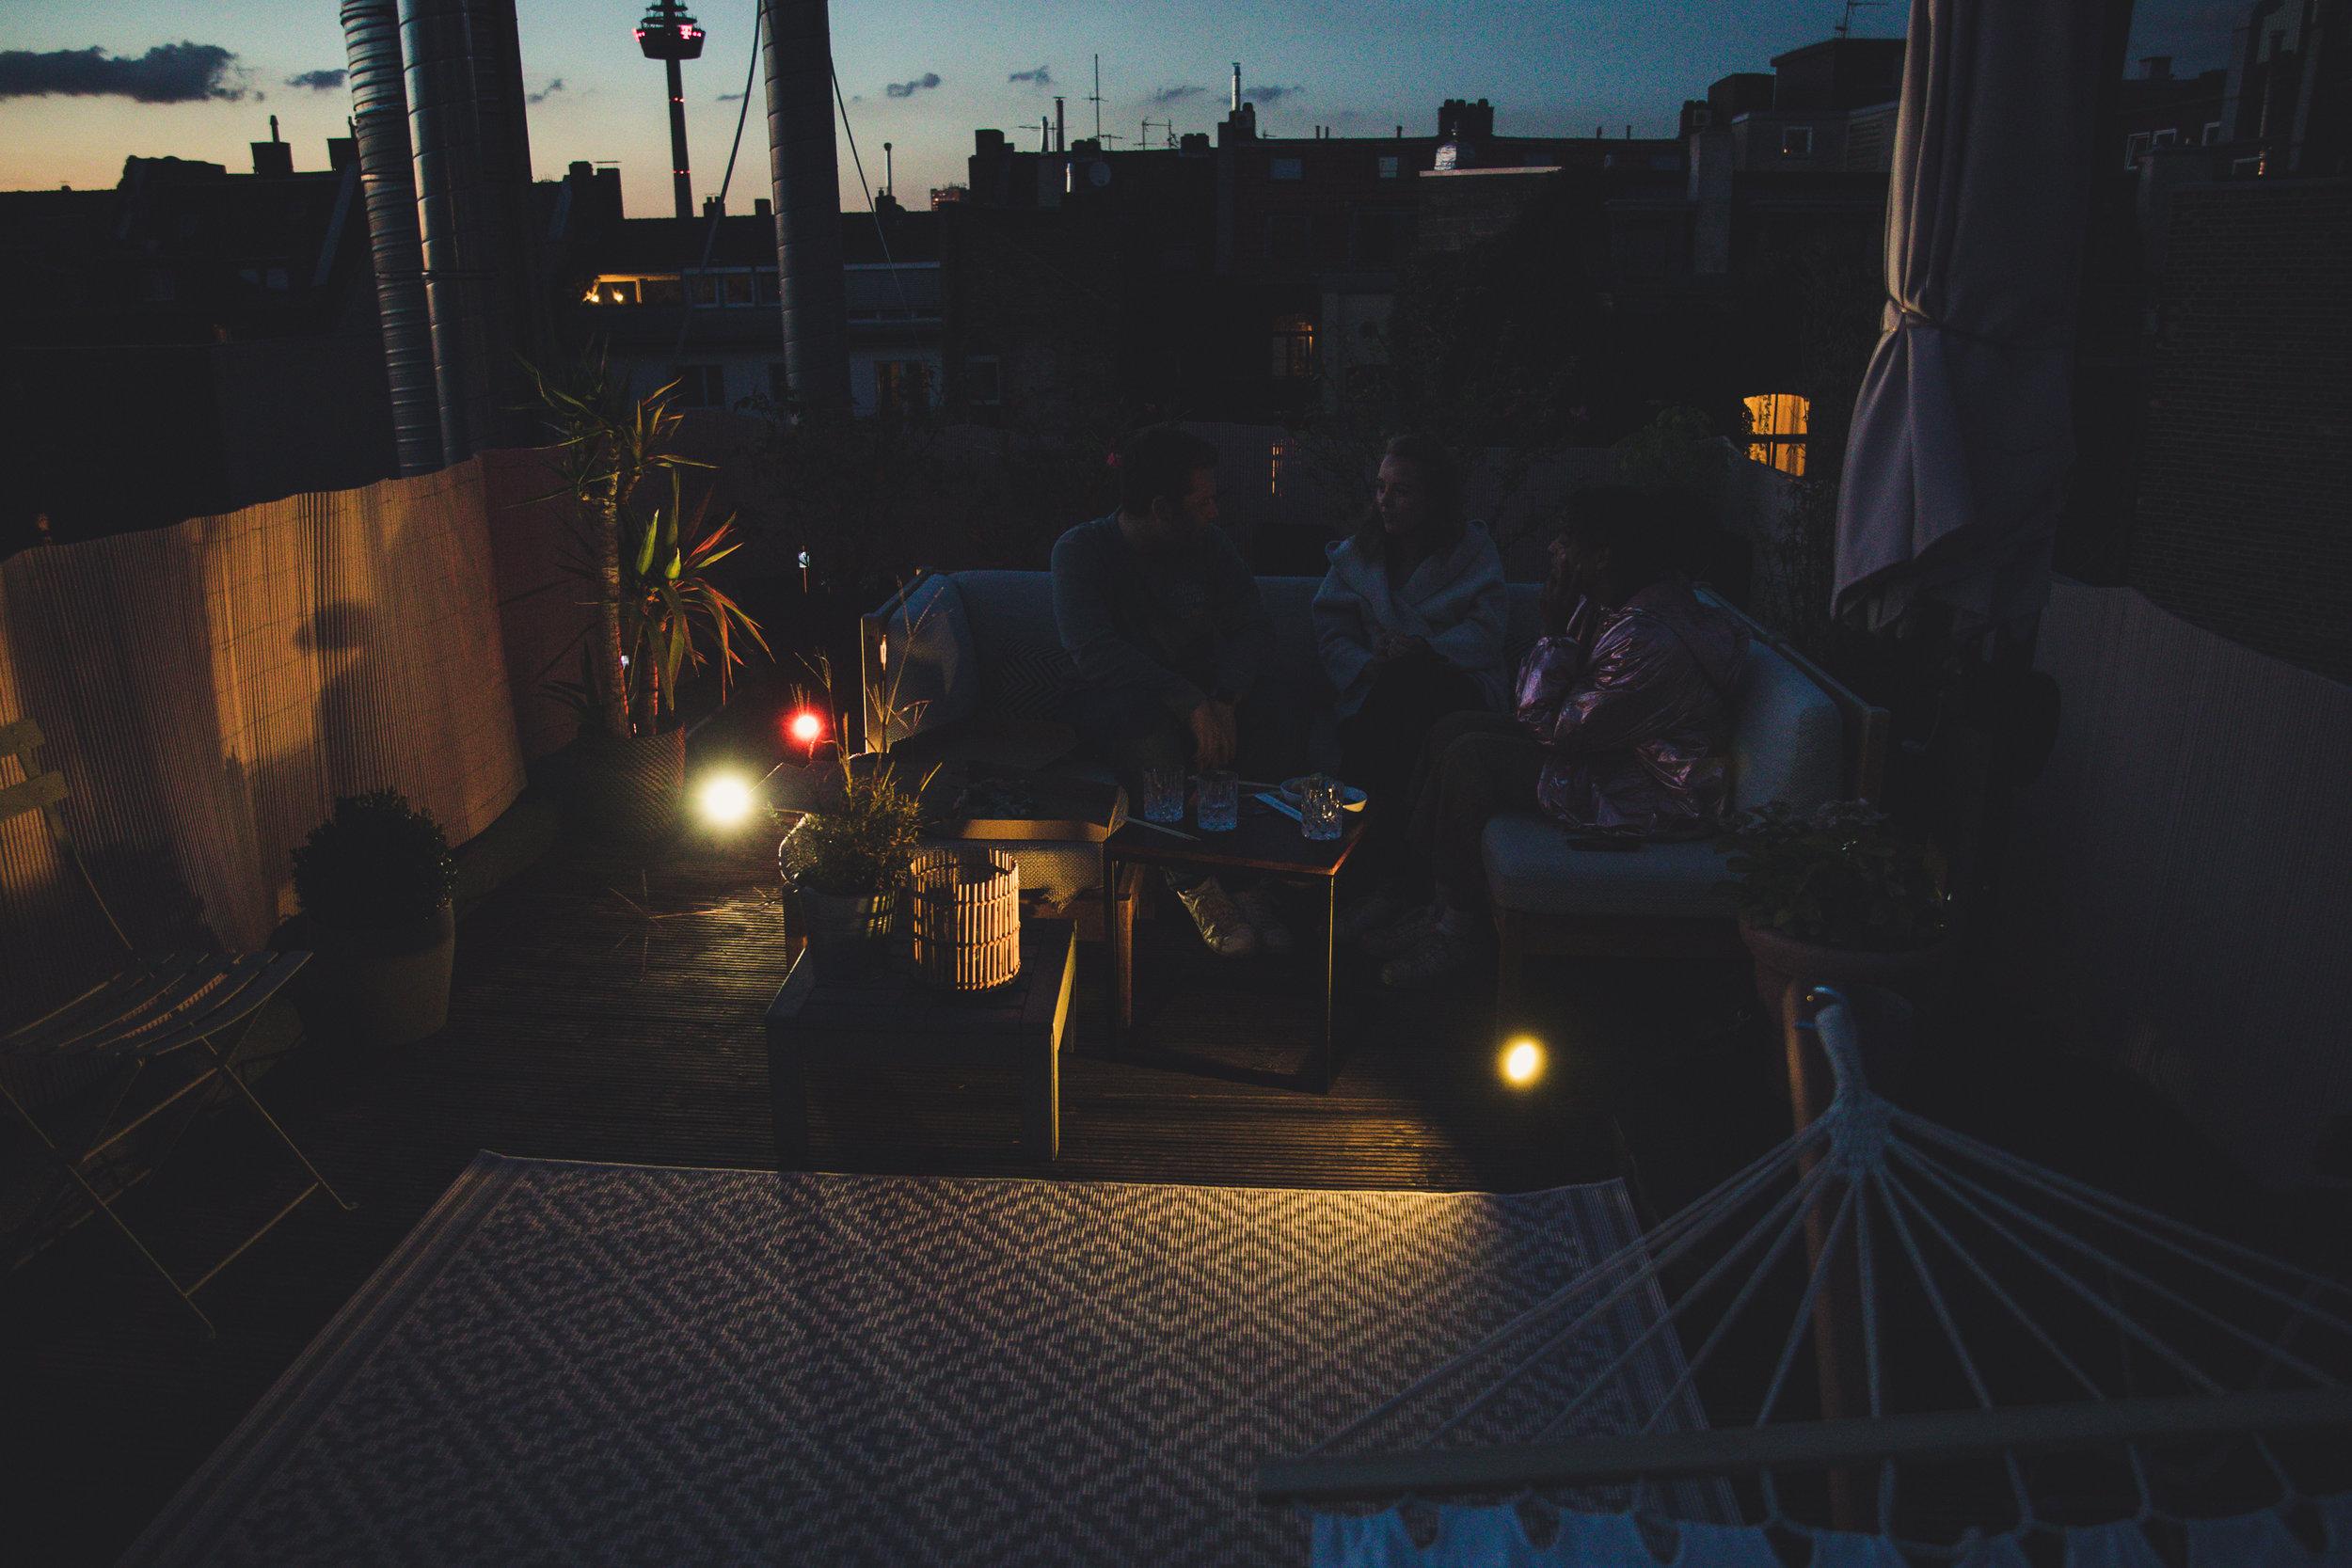 philips-hue-outdoor-spotlife-thomasbanik-3163.jpg